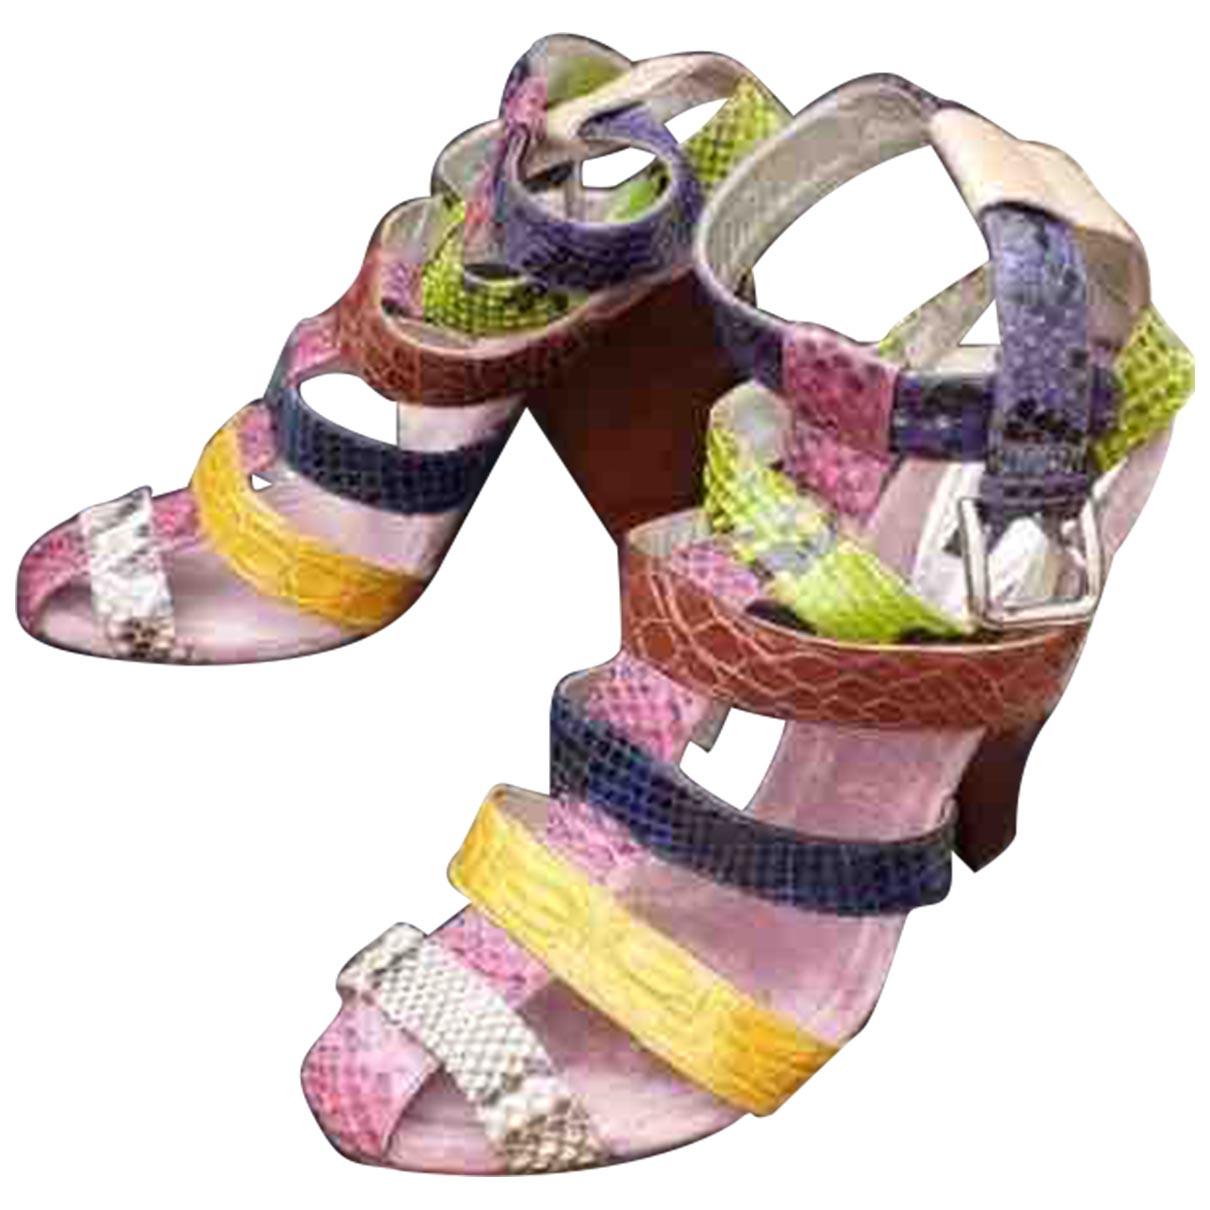 Dolce & Gabbana \N Sandalen in  Bunt Exotenleder